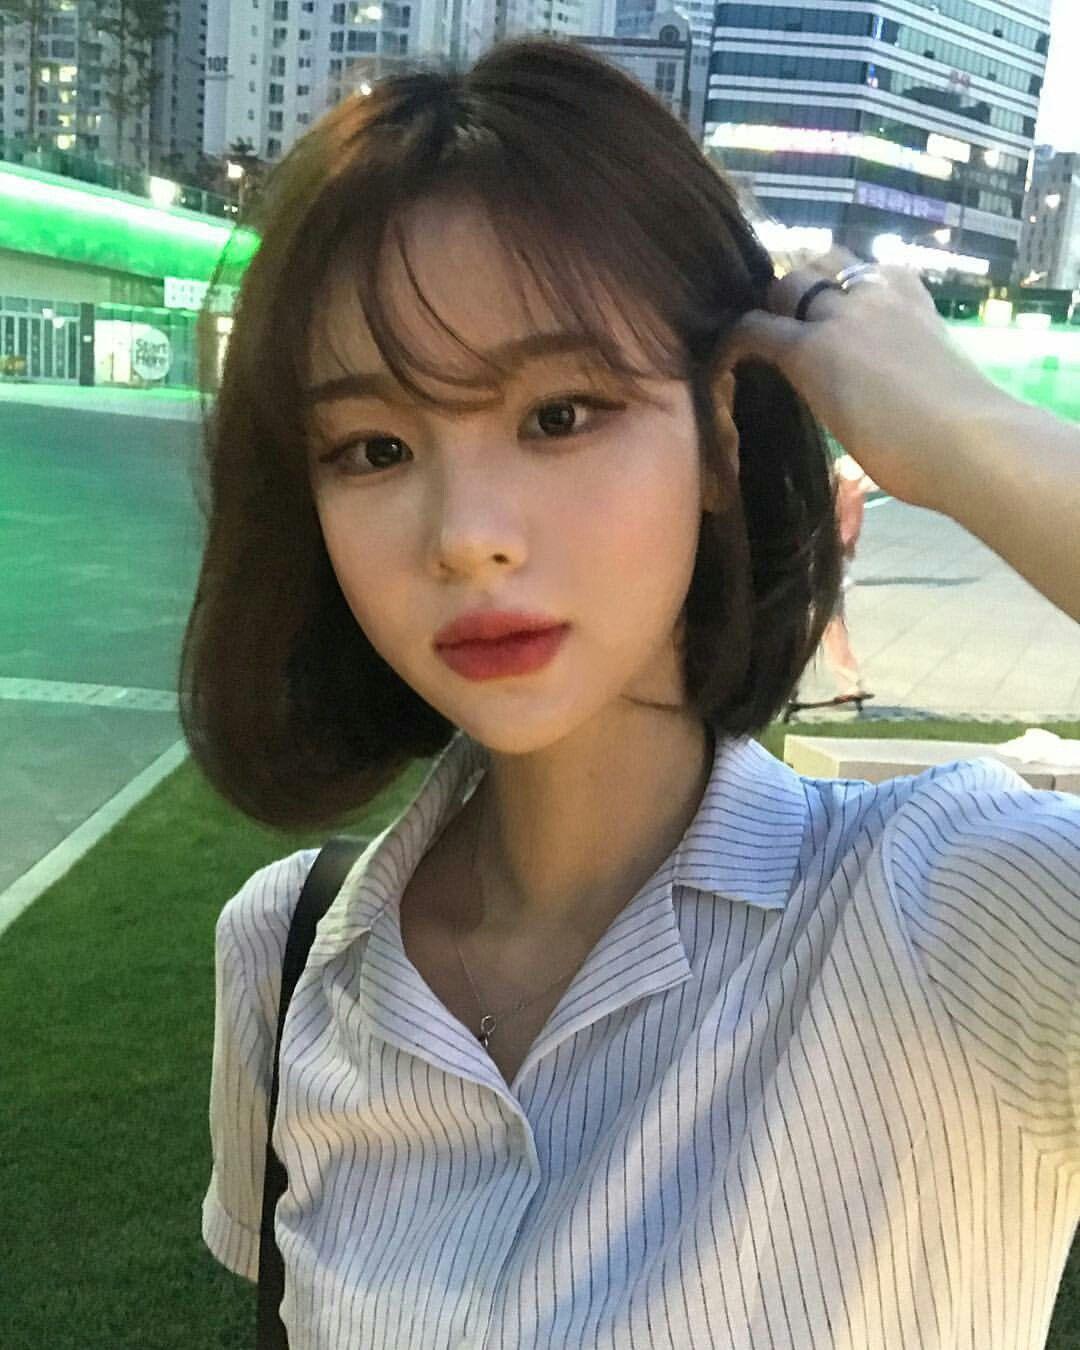 See Through Bangs Short Hair : through, bangs, short, Ulzzang, Short, Bangs,, Korean, Asian